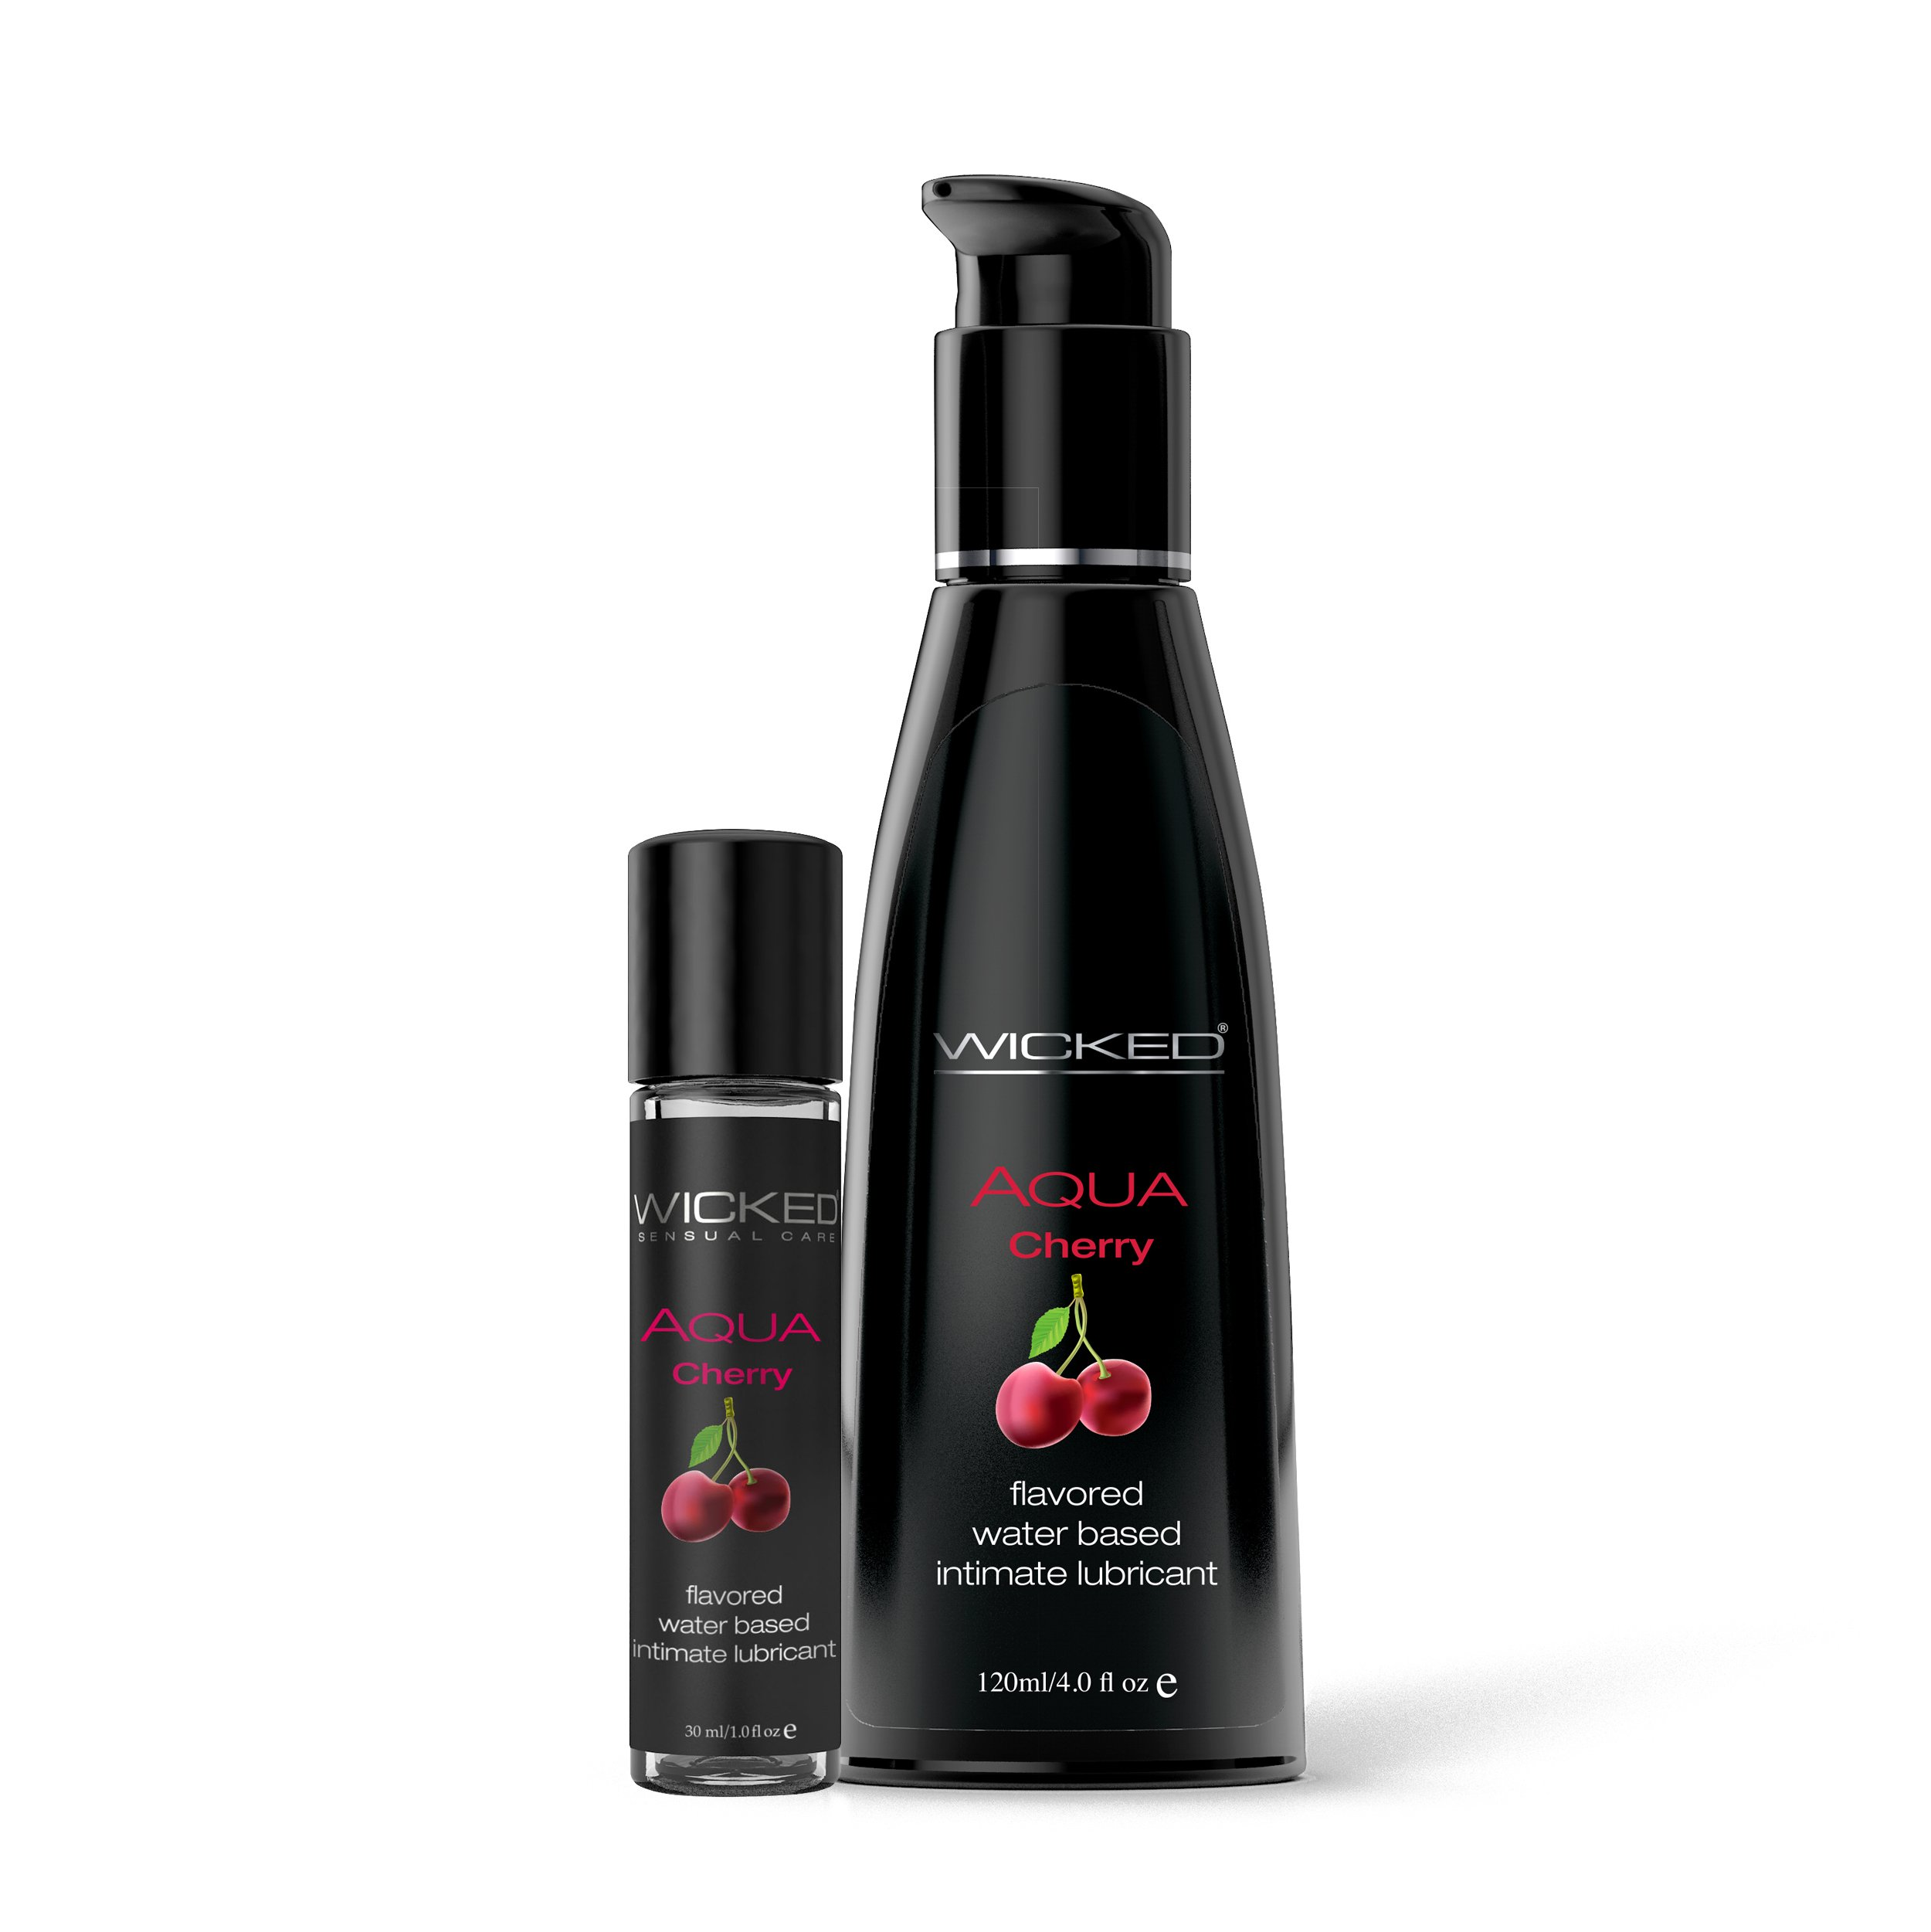 AQUA Cherry | Brands, Wicked Sensual Care, GLIDMEDEL ETC., GLIDMEDEL, Vattenbaserade glidmedel | Intimast.se - Sexleksaker